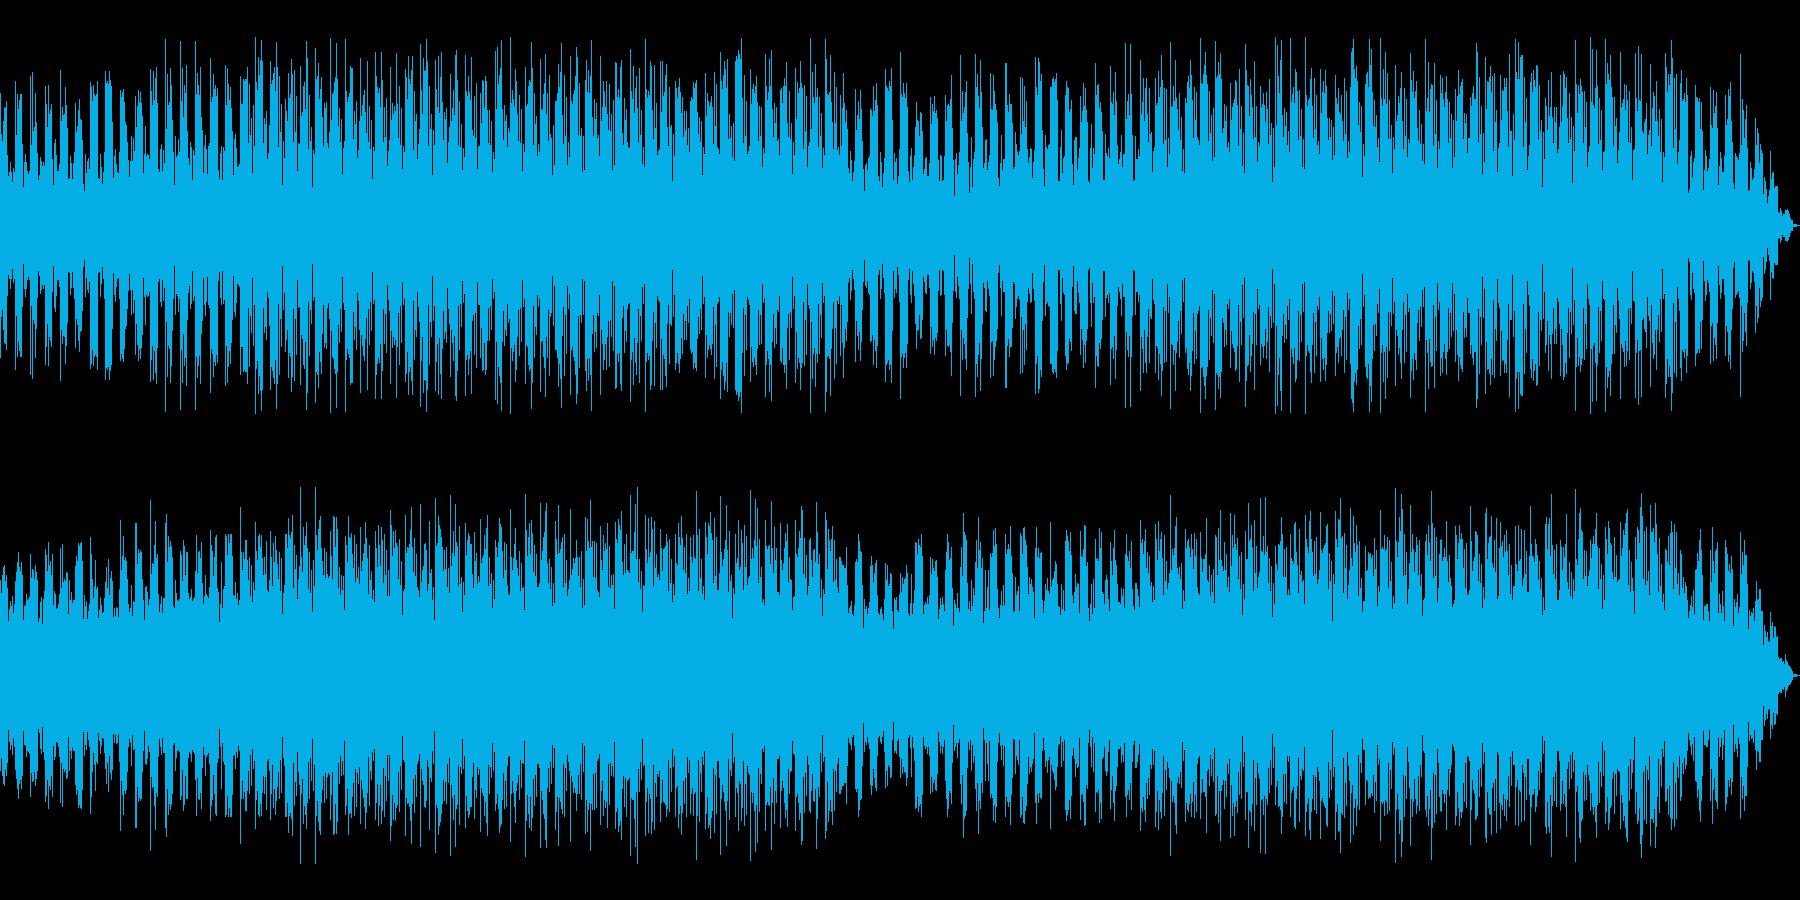 AIやアンドロイドのシステム起動中の再生済みの波形